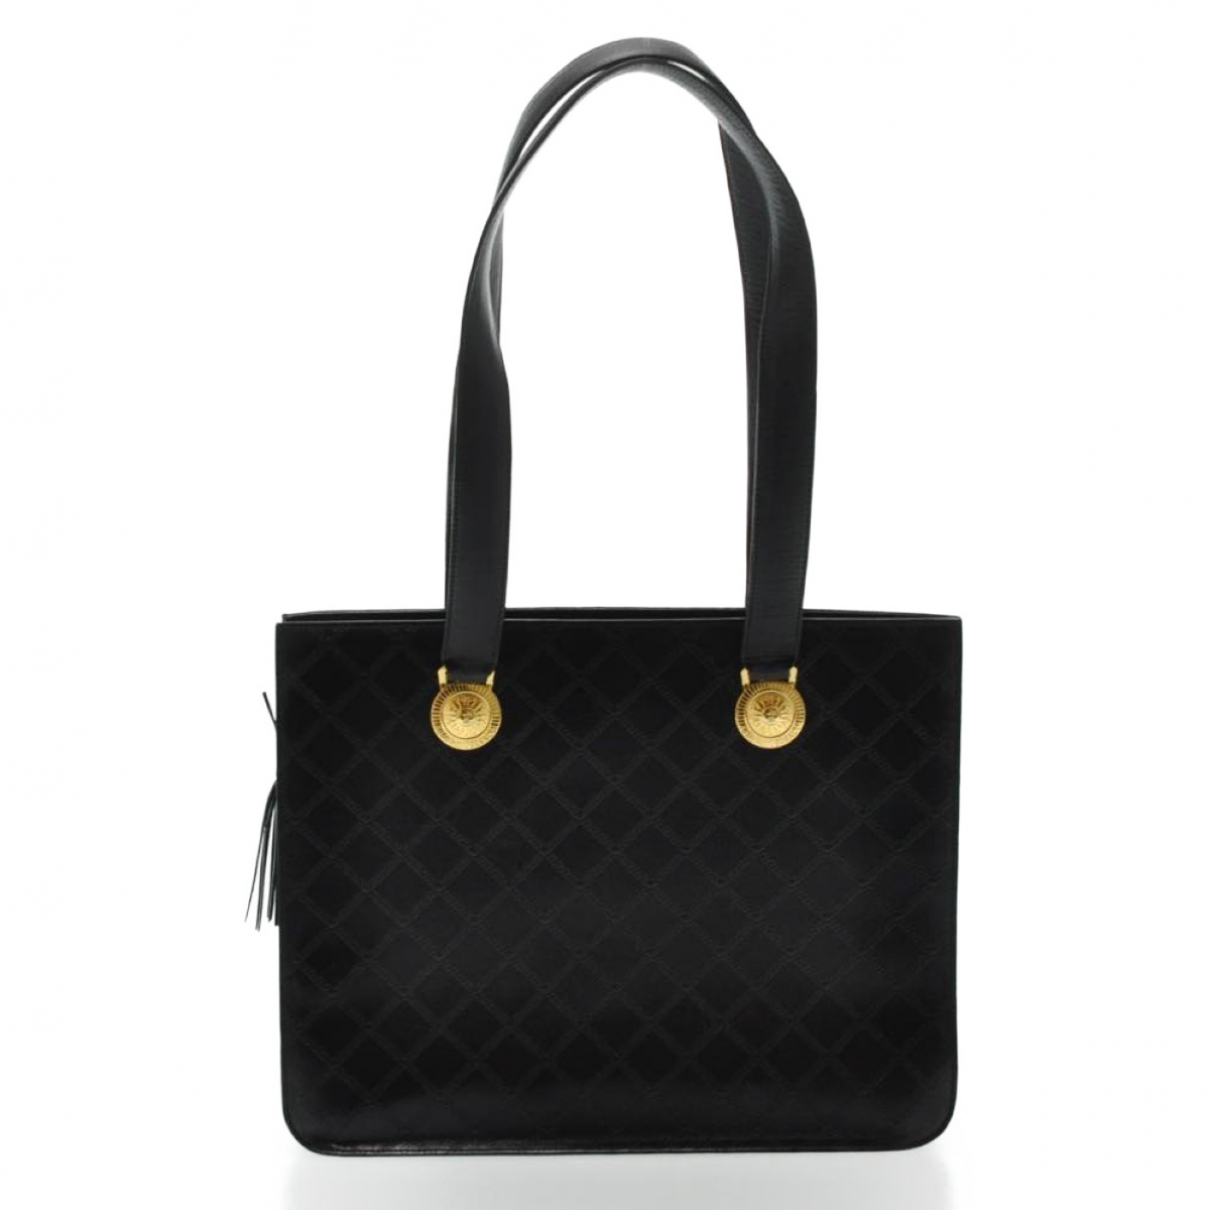 Gianni Versace \N Black Leather handbag for Women \N